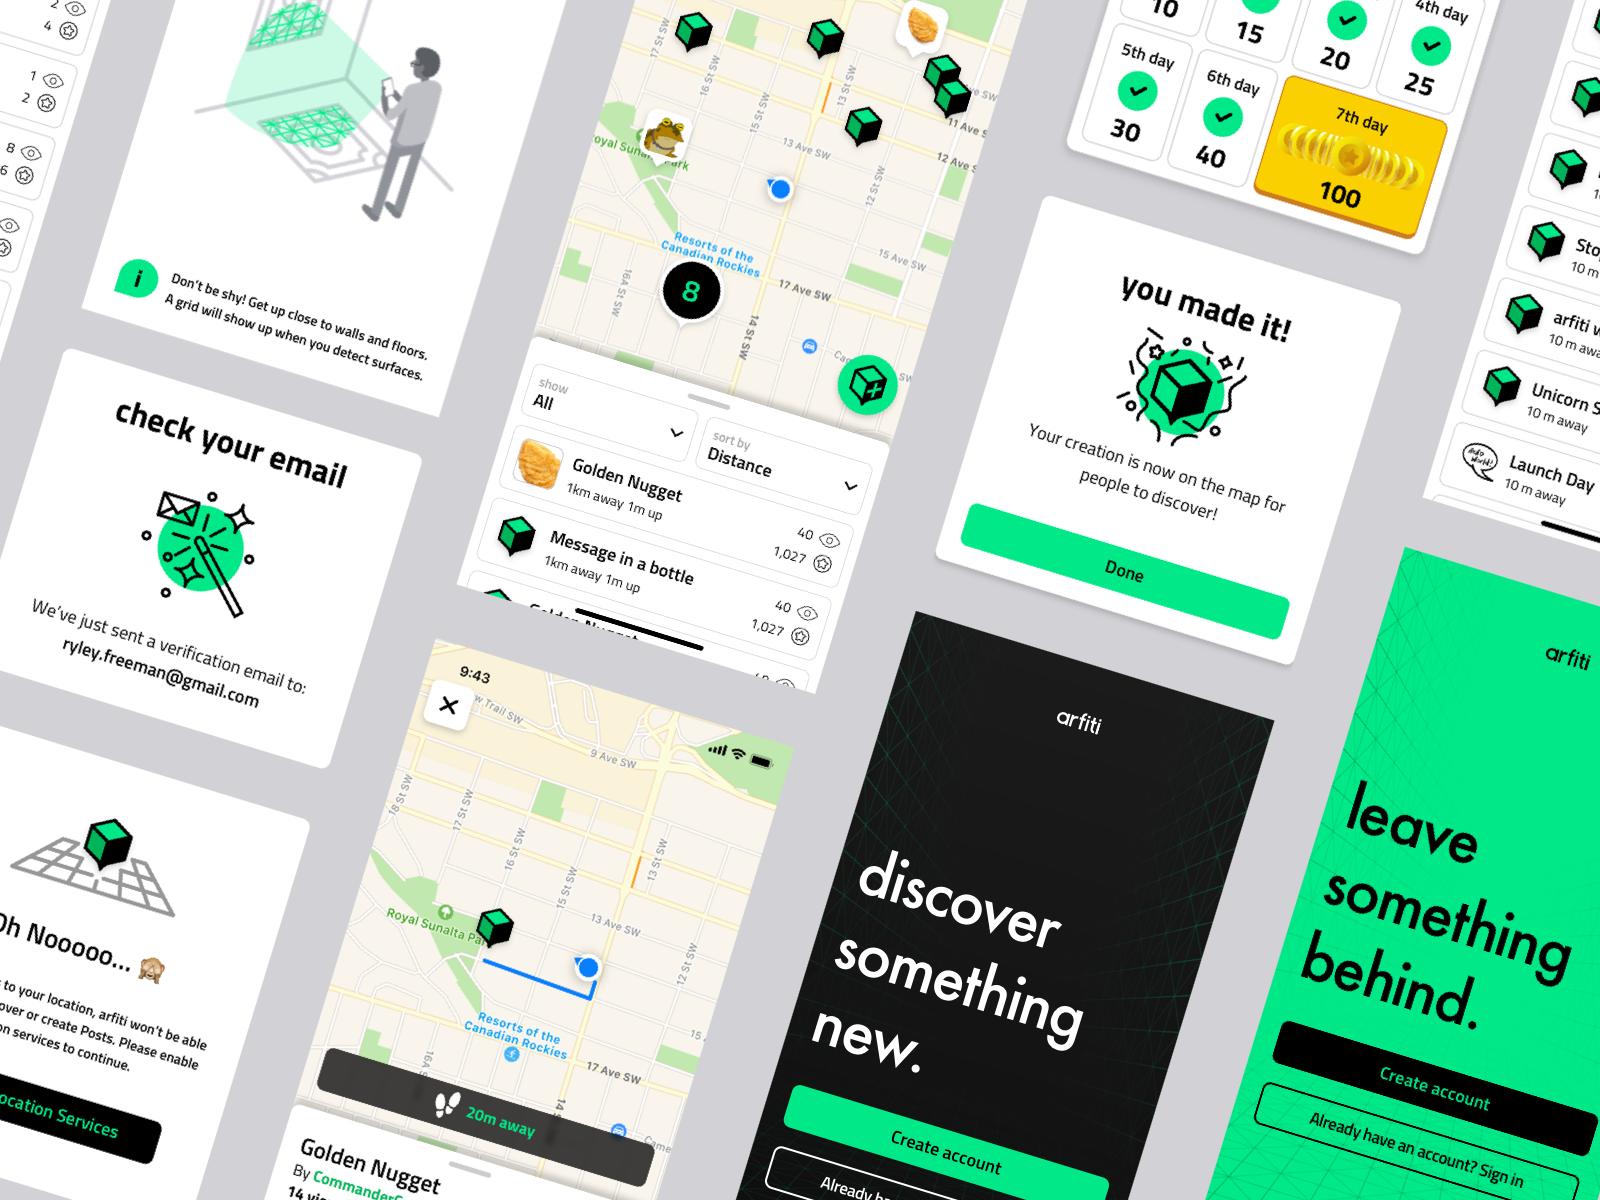 arfiti app - Overview by Matthew